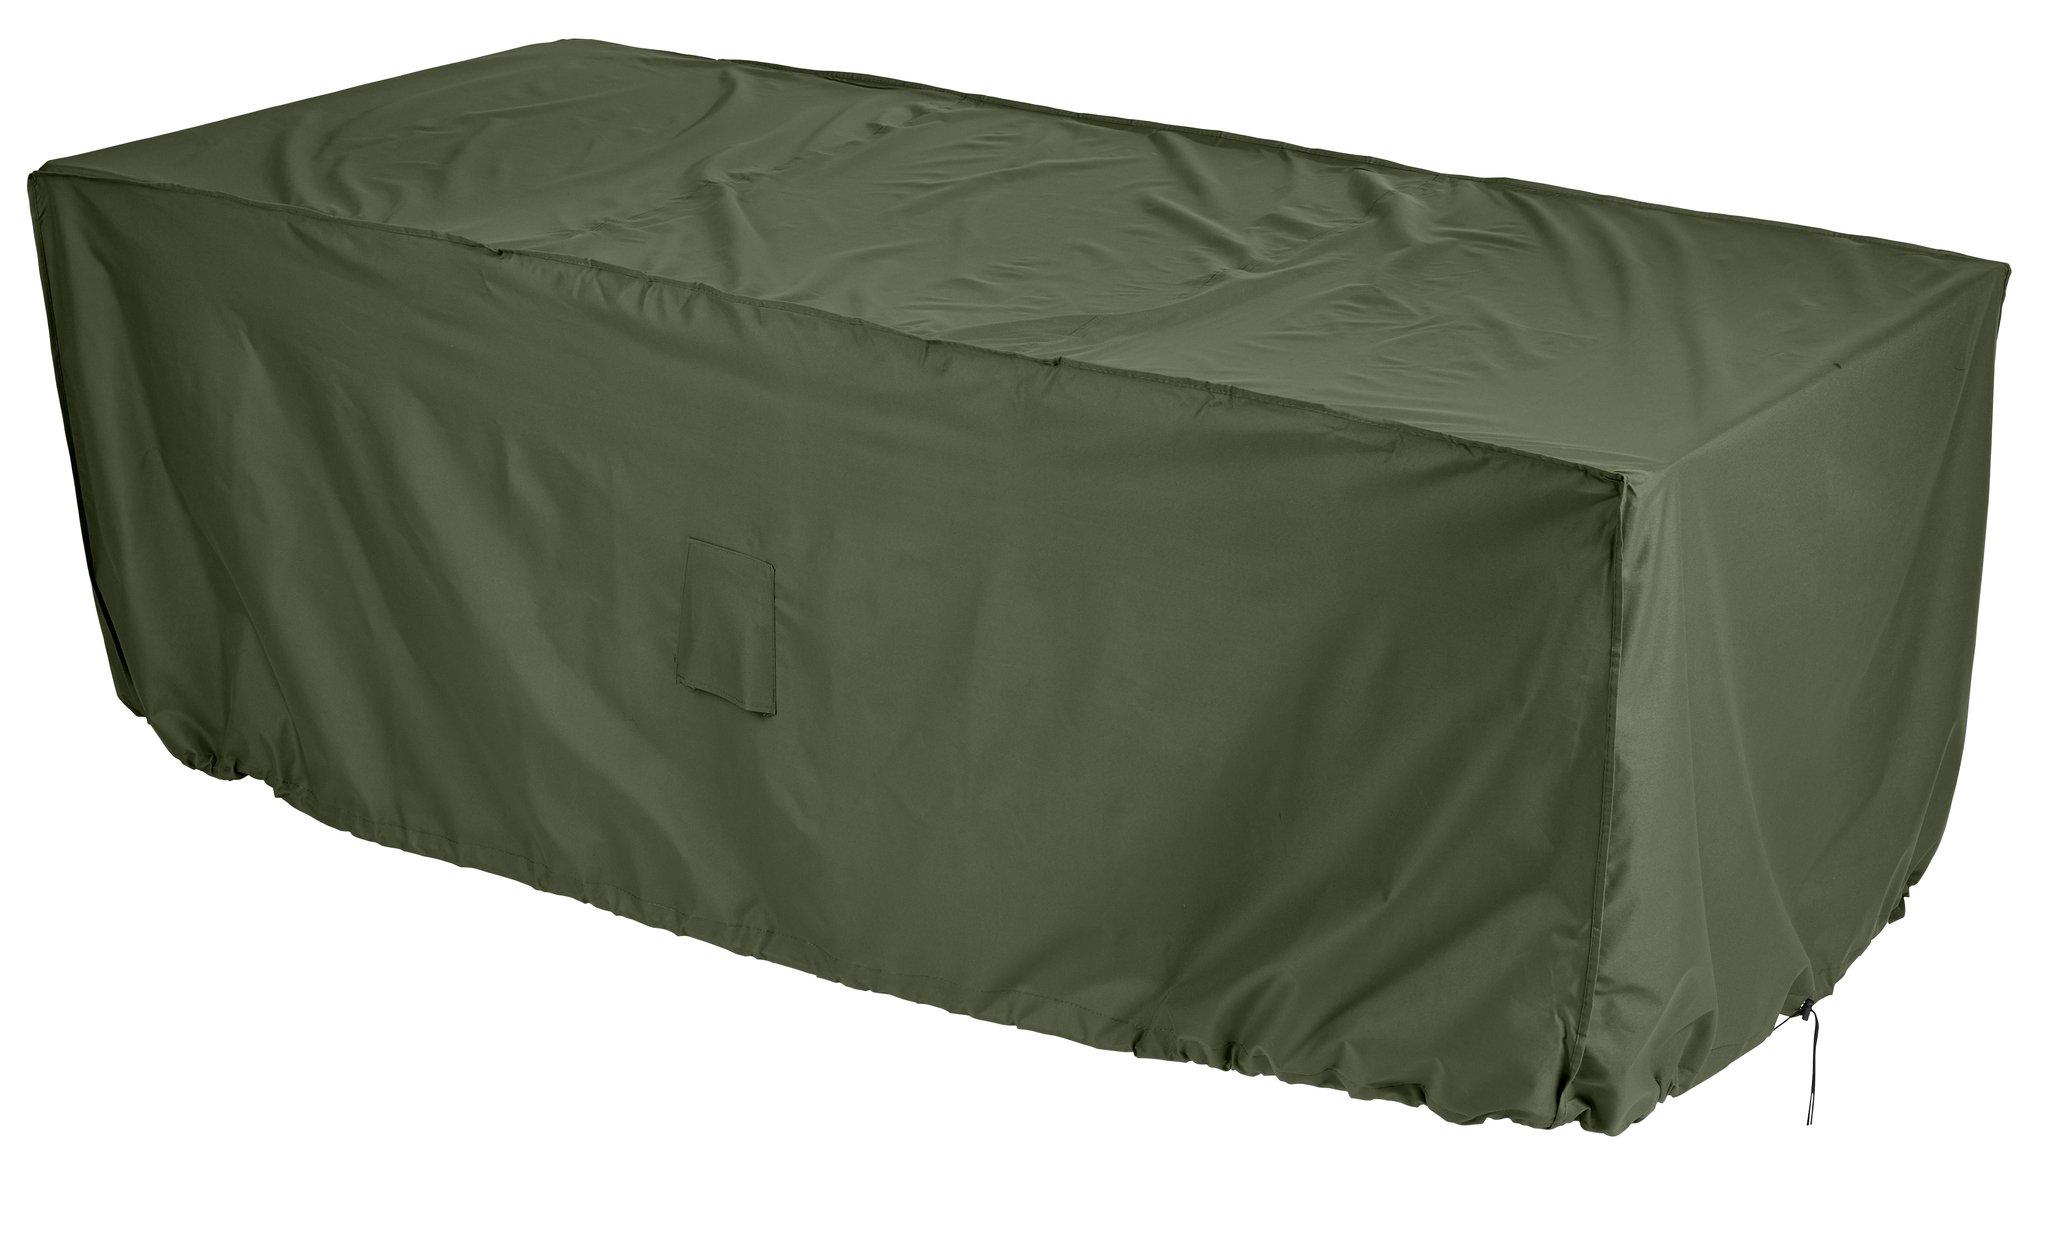 Gardman - Rectangular - 4 to - 6 Seater Patio Set Cover - Green lowest price